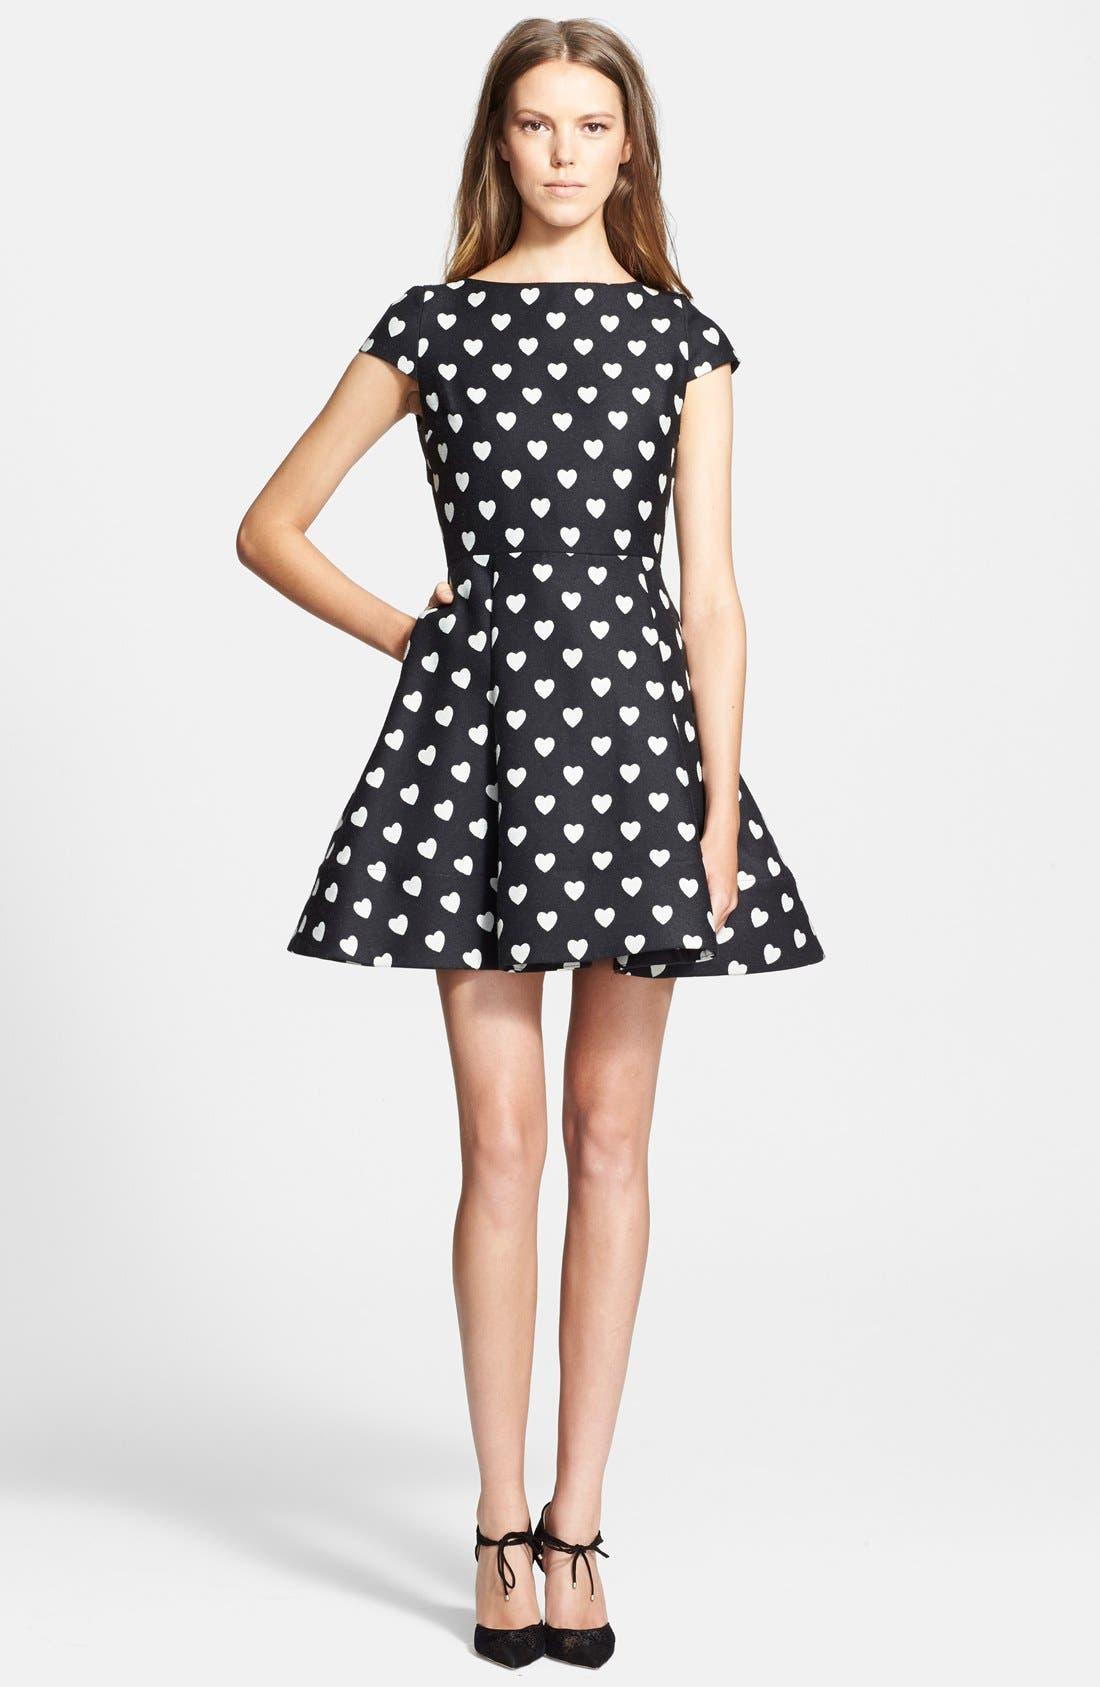 Alternate Image 1 Selected - Alice + Olivia 'Amor' Fit & Flare Dress